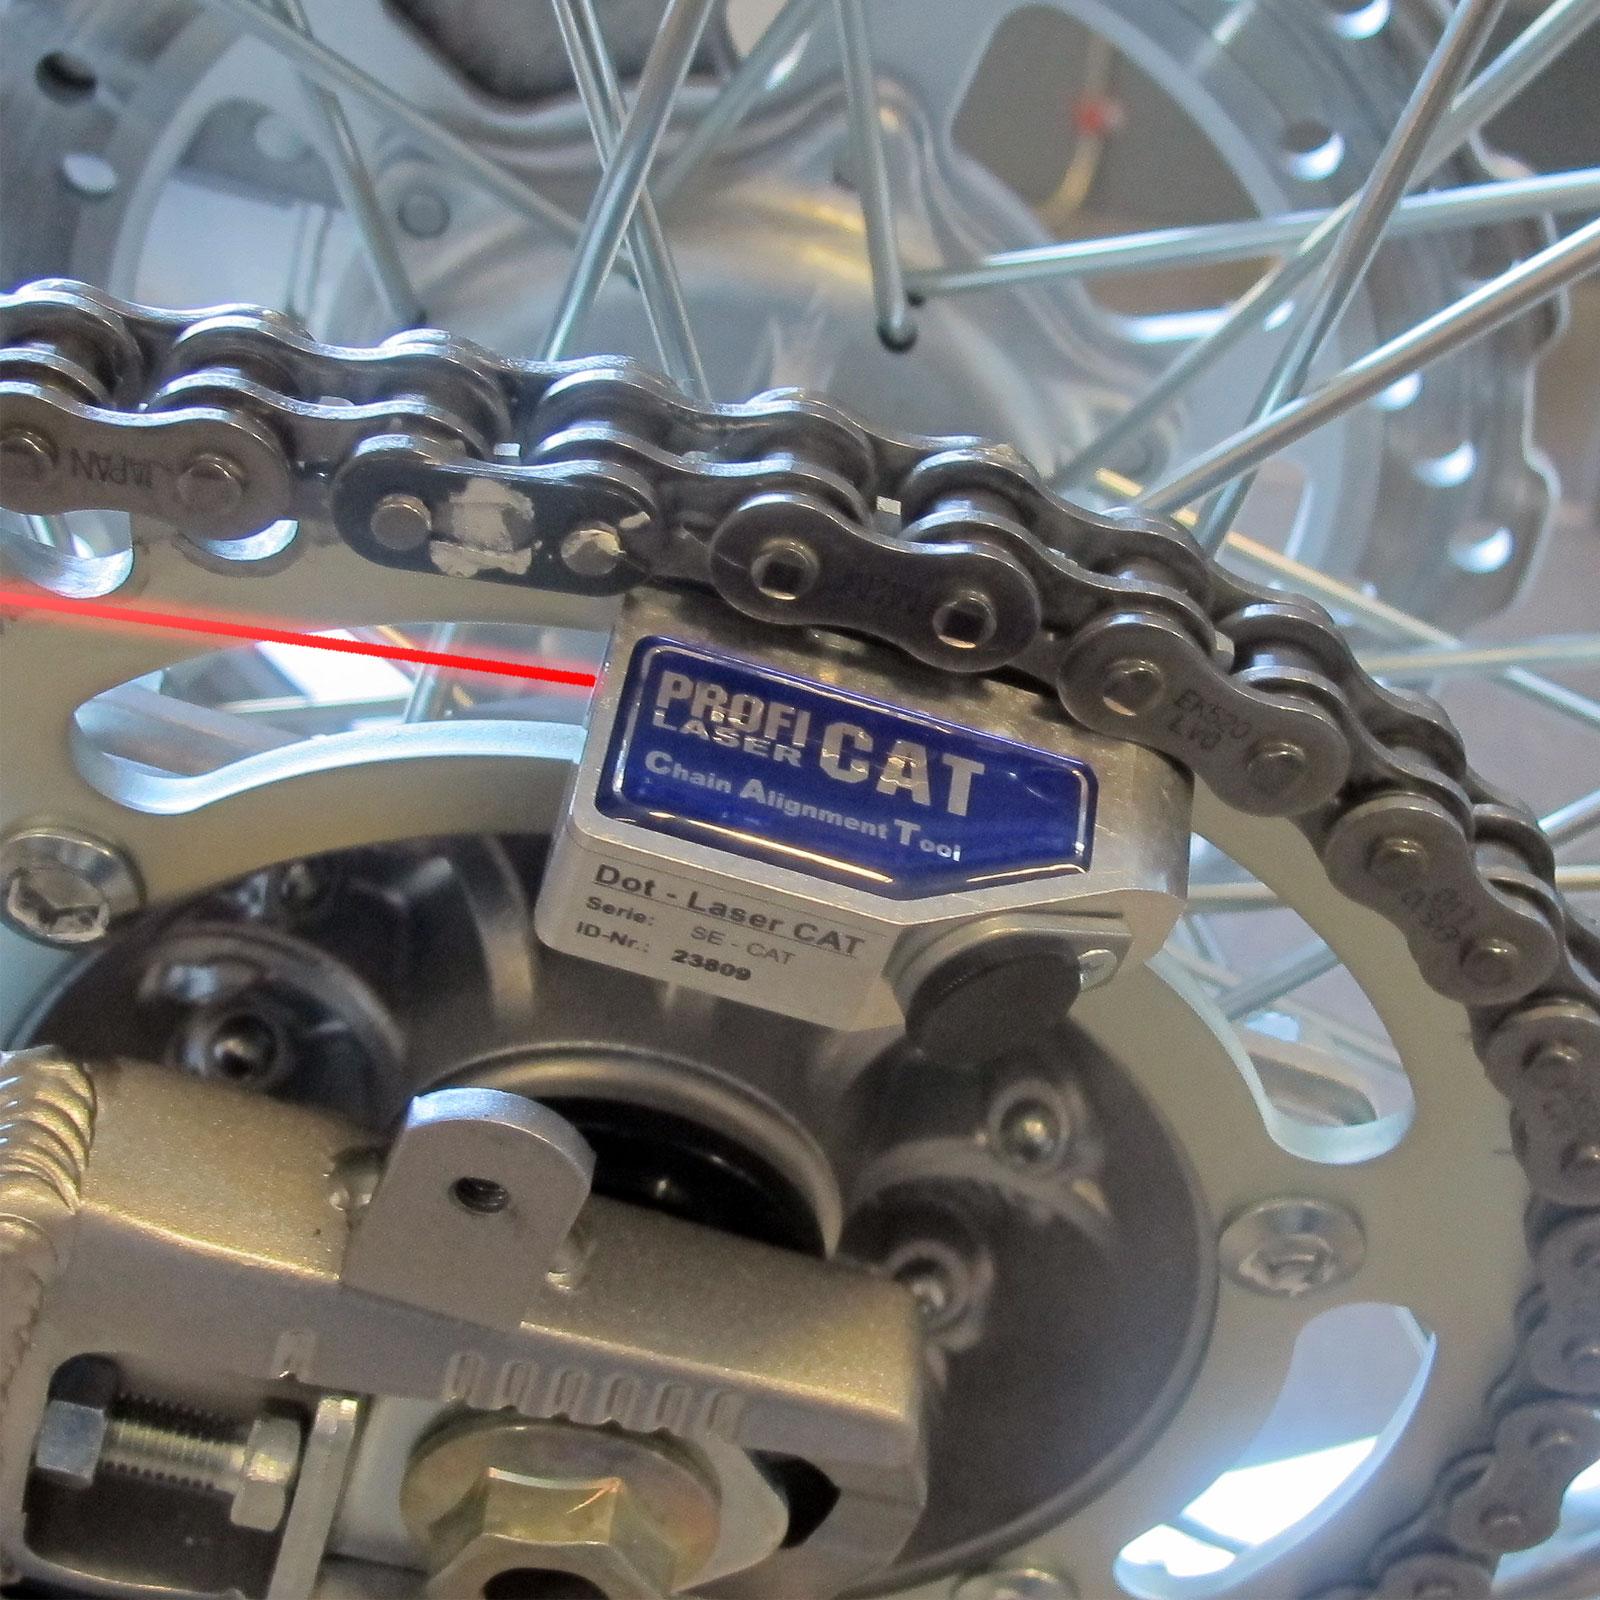 Motorcycle Wheel Alignment Tool Related Keywords